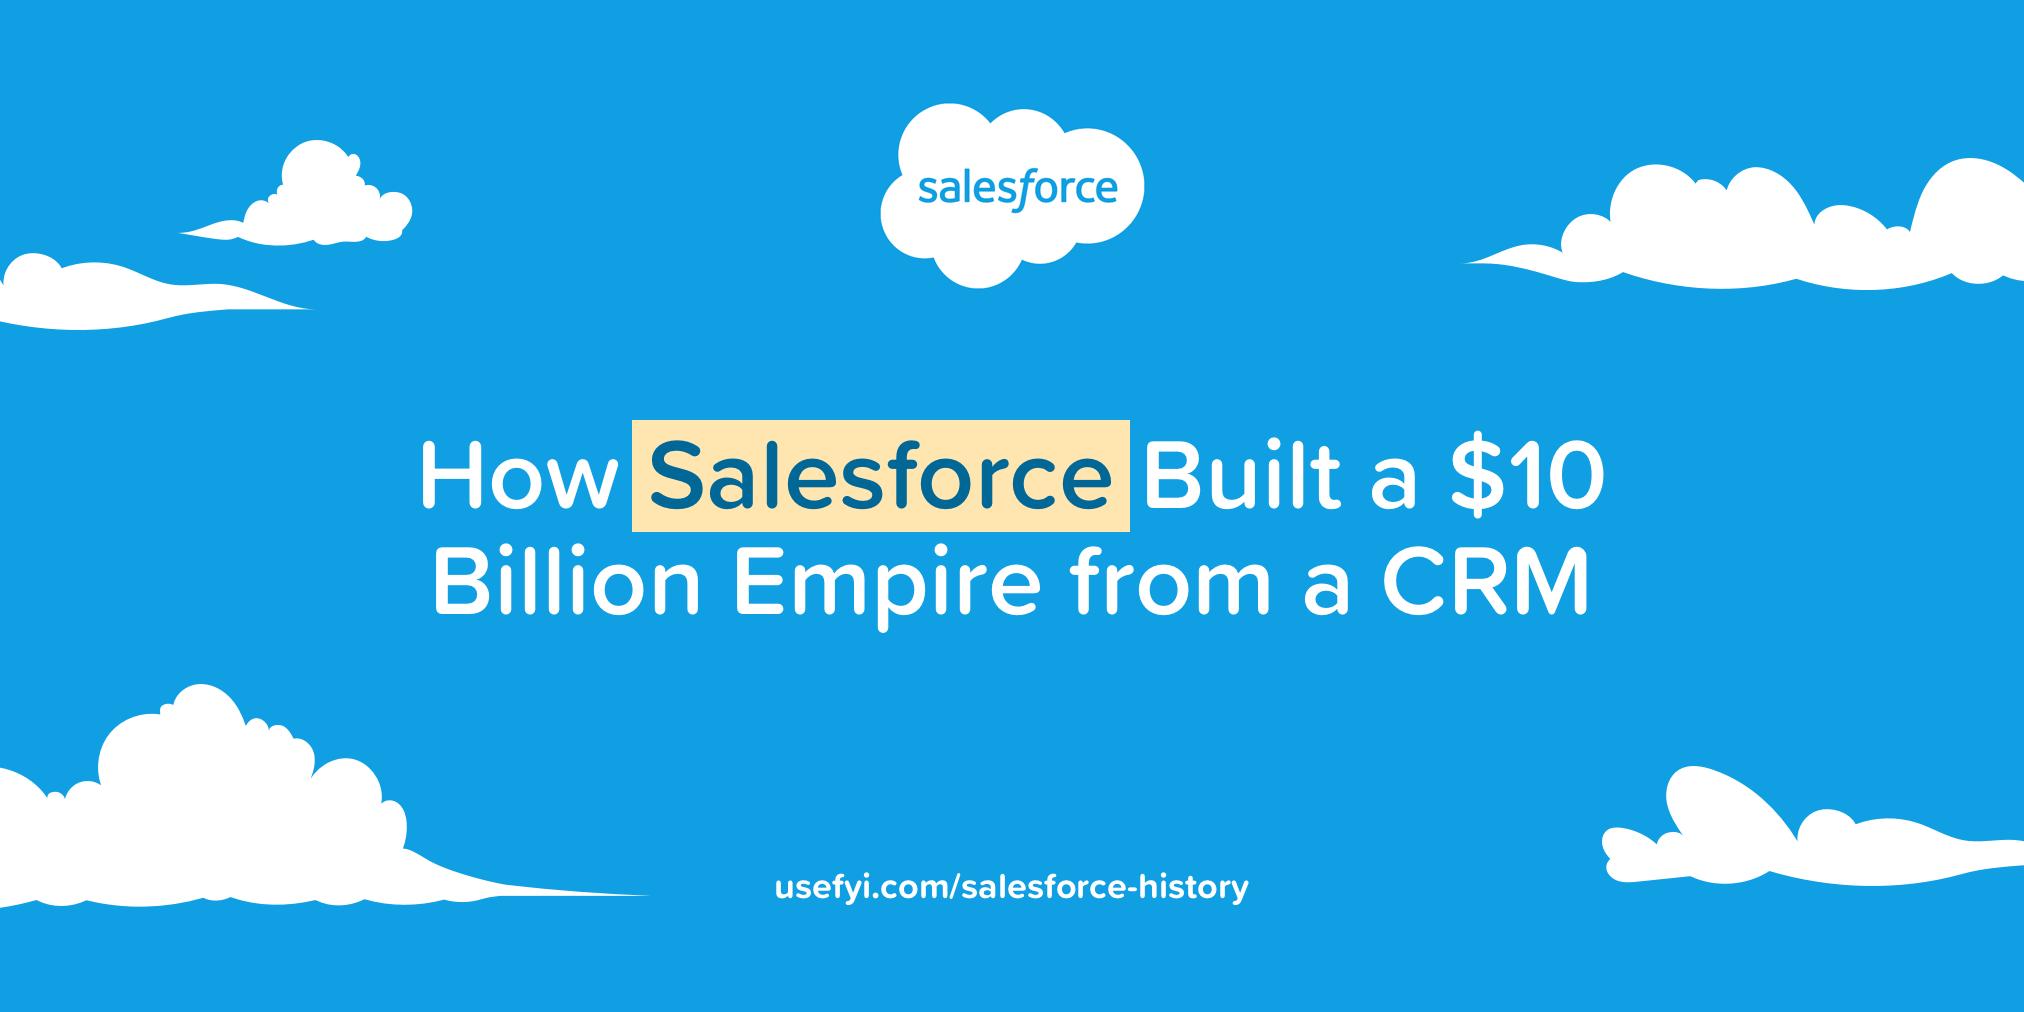 Salesforce History